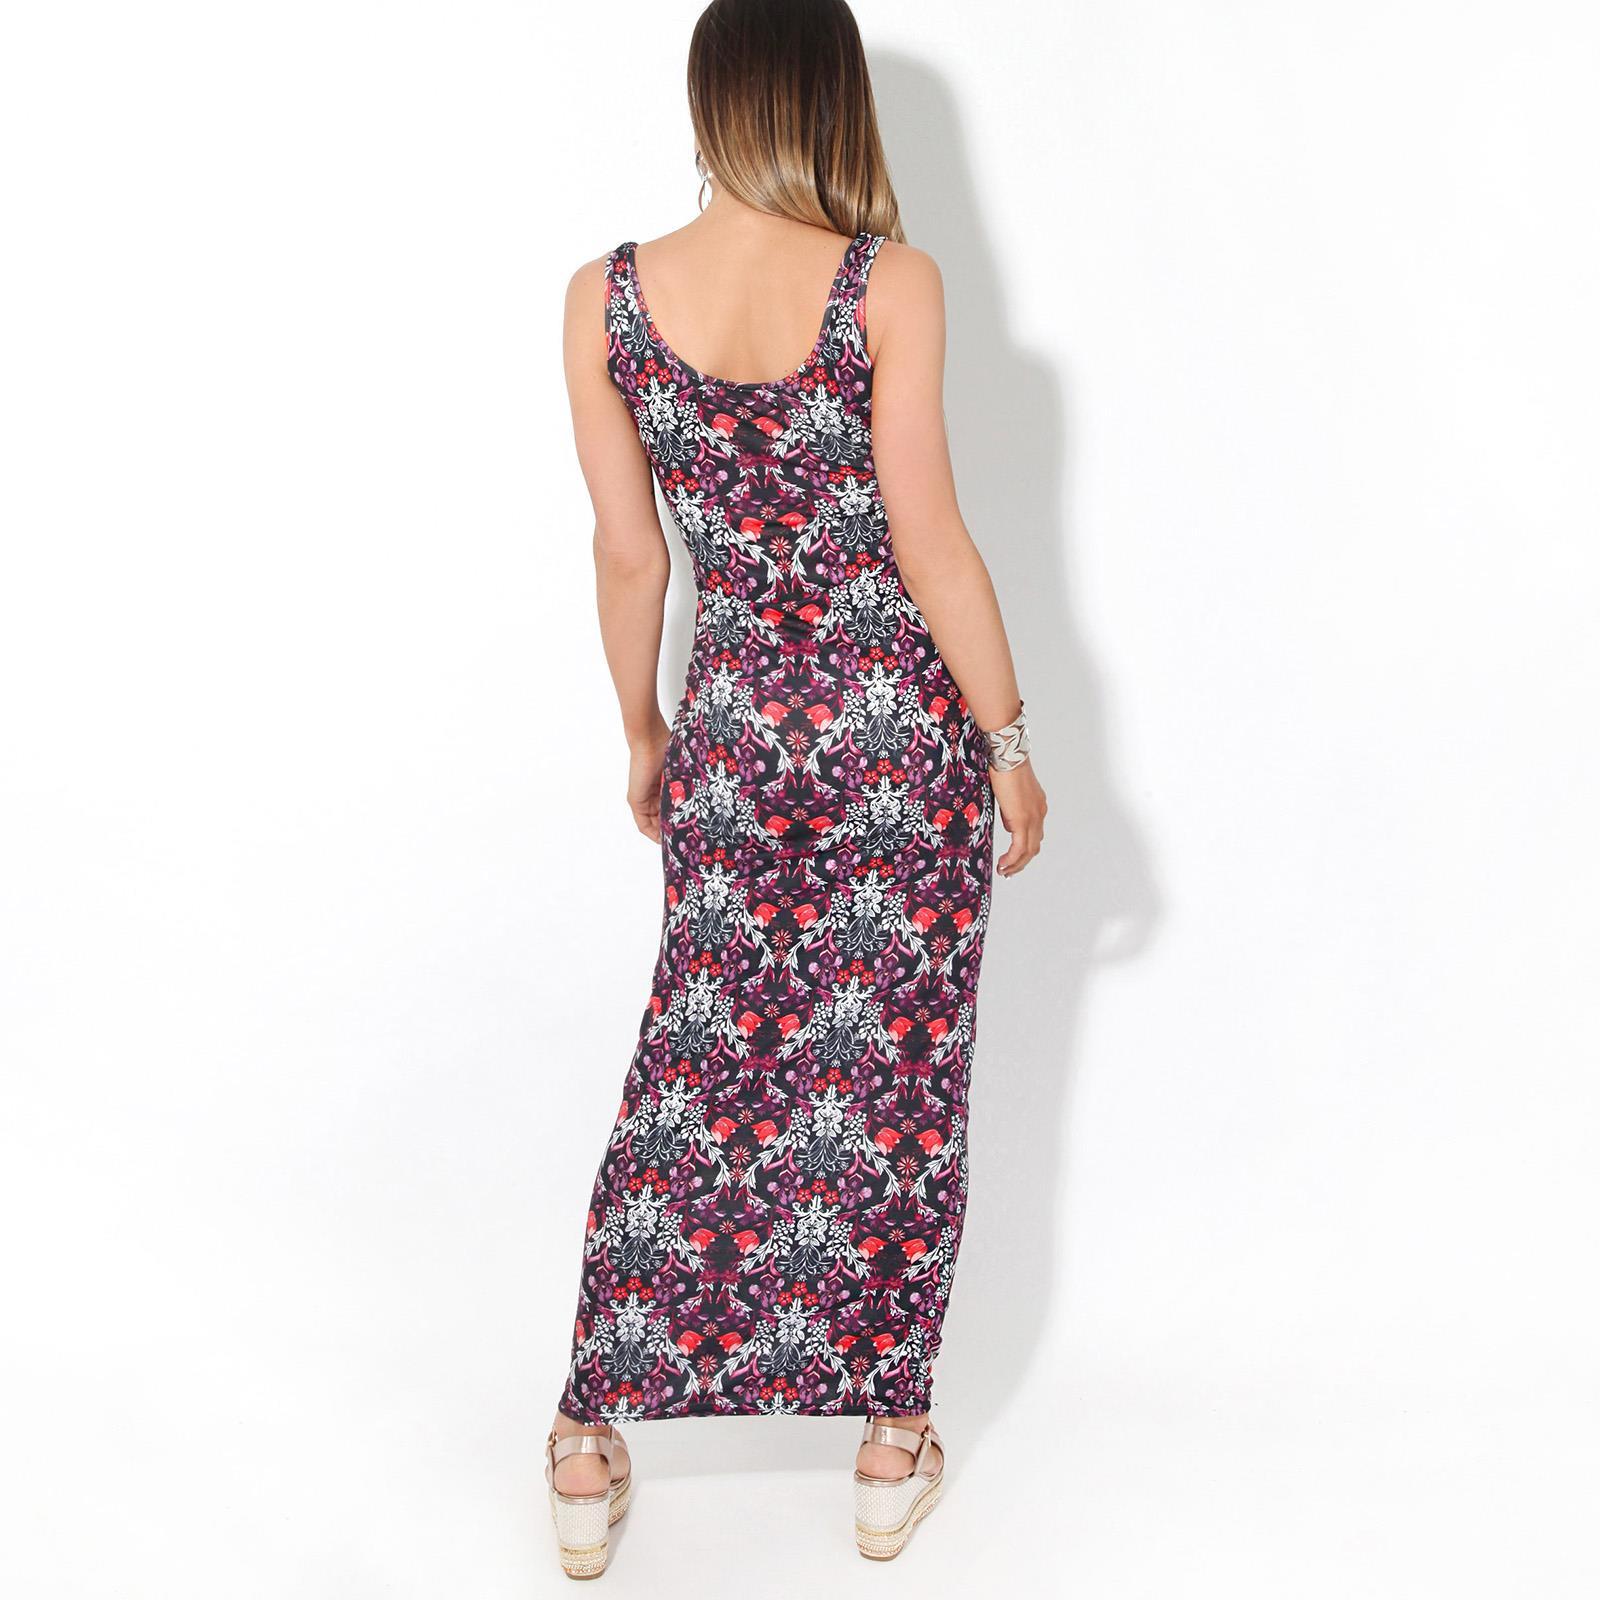 Womens-Ladies-Floral-Bodycon-Maxi-Long-Sun-Dress-Sleeveless-Pattern-Summer-Beach thumbnail 4